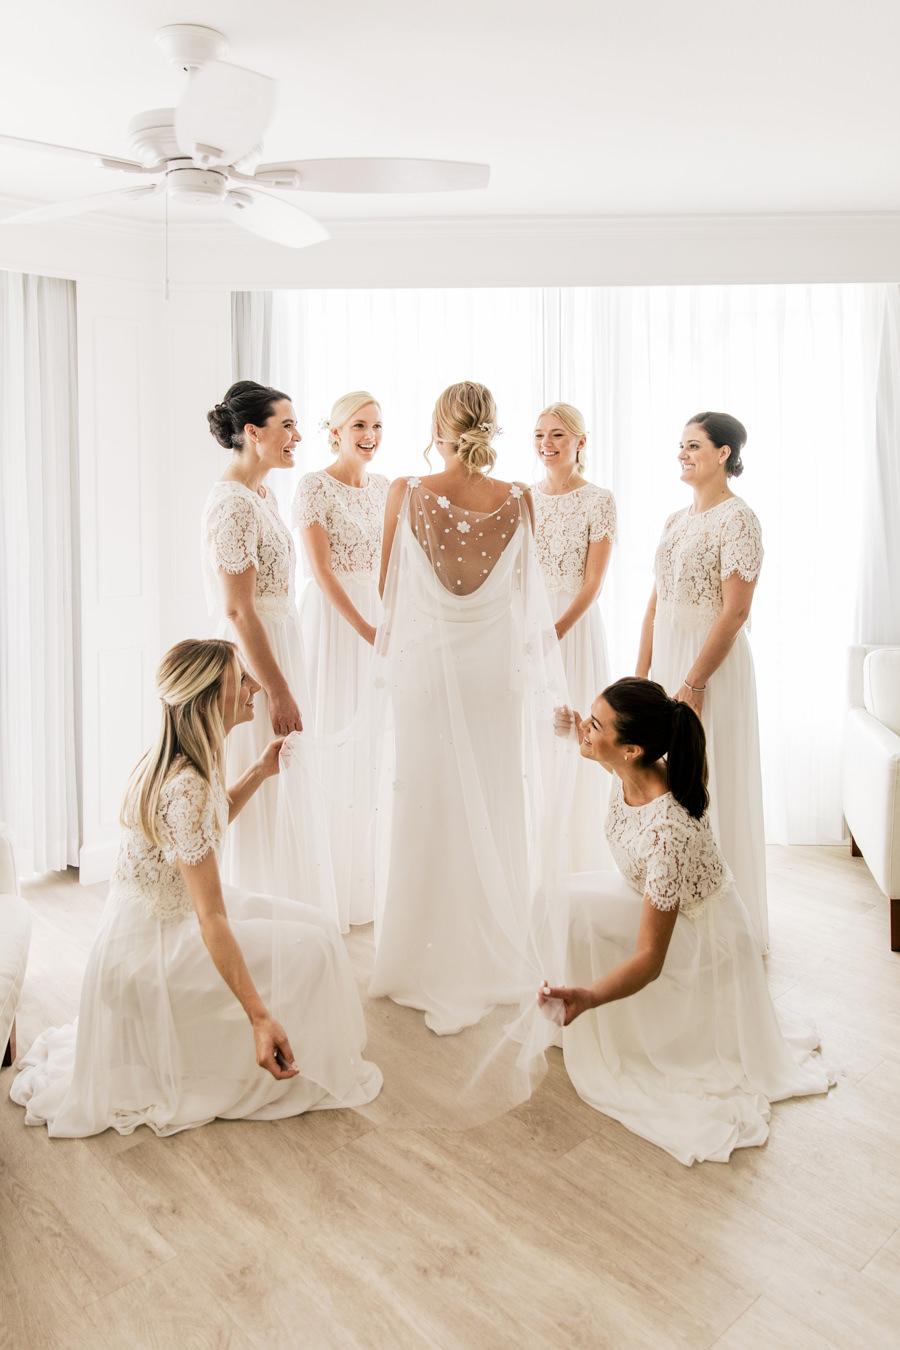 South Seas Captiva Wedding Photographer